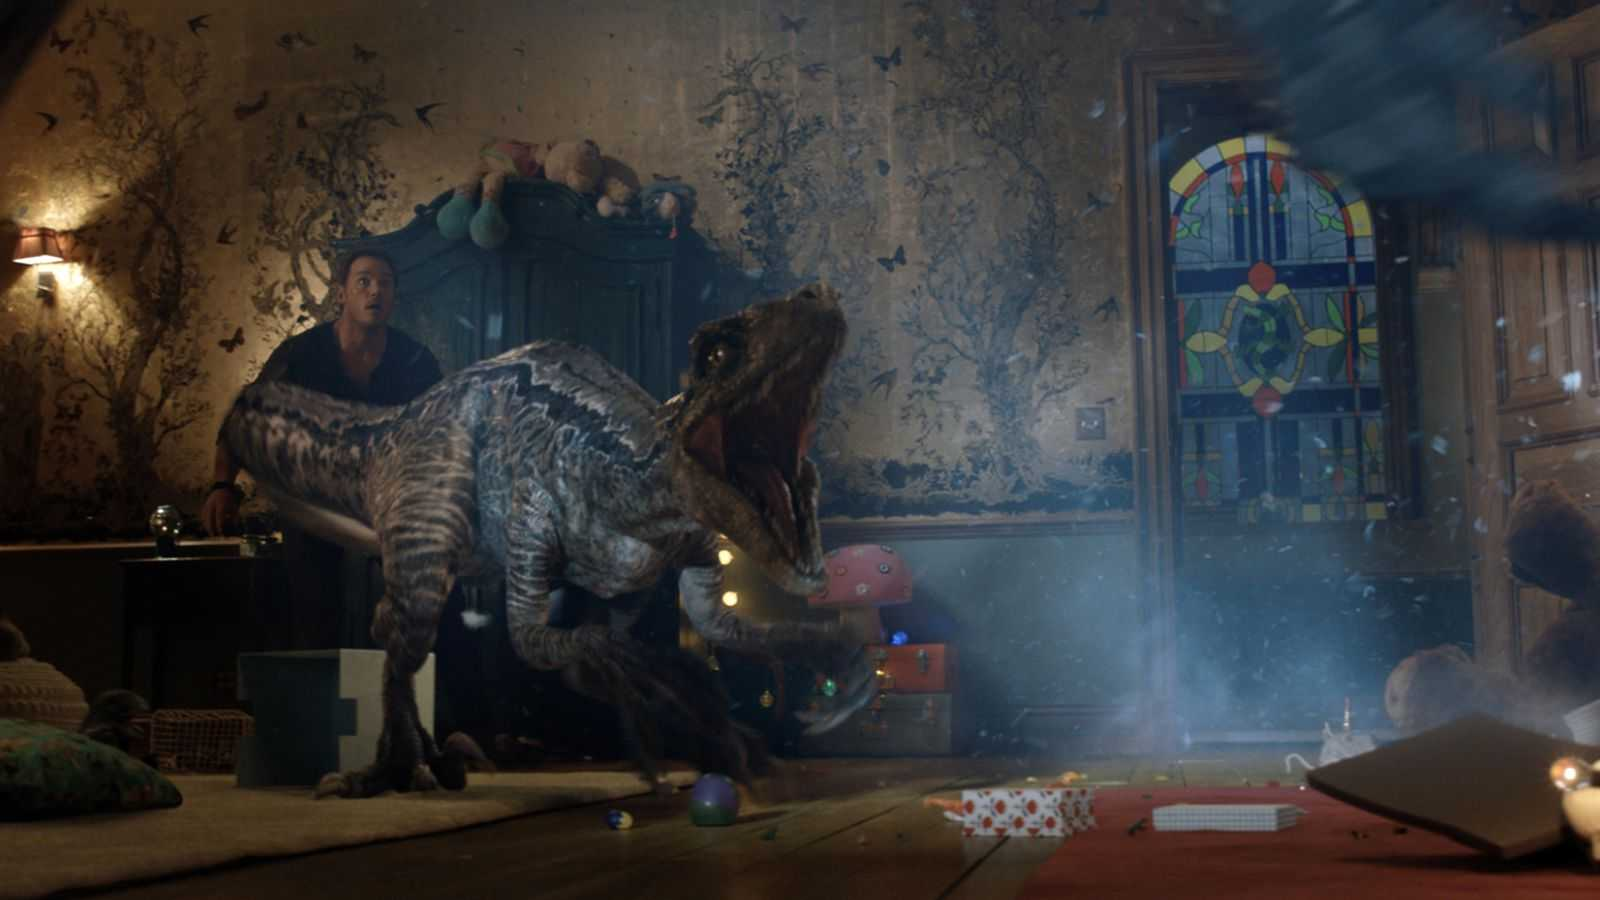 'Jurassic World: Fallen Kingdom' Brings The Action But Not The Story | Jurrasic World Fallen Kingdom